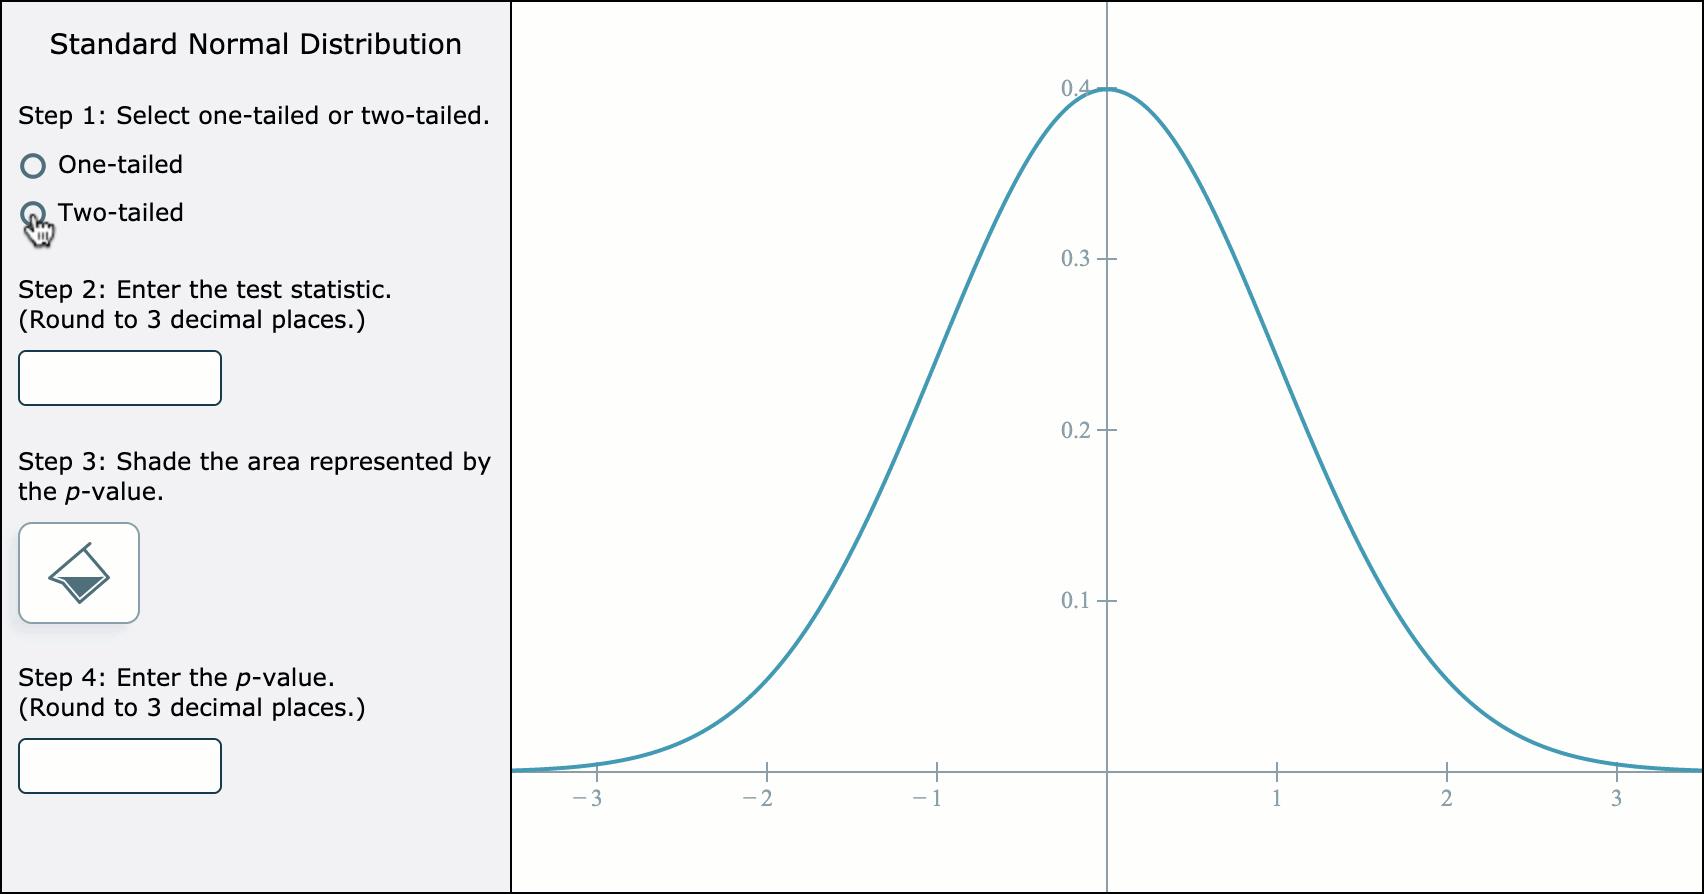 Standard Normal Distribution tool